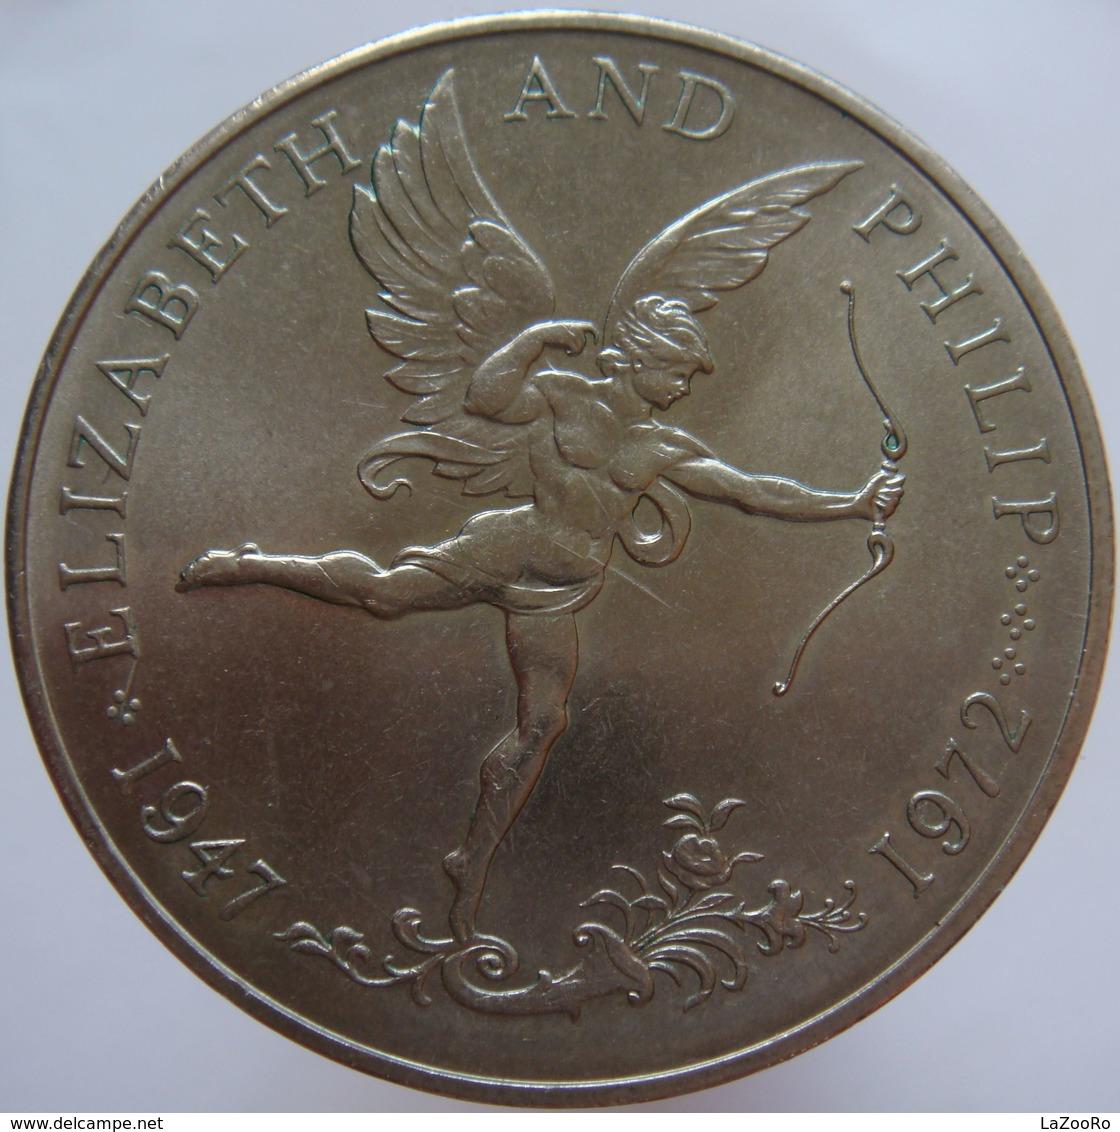 Guernsey 25 Pence 1972 UNC Scarce - Guernsey